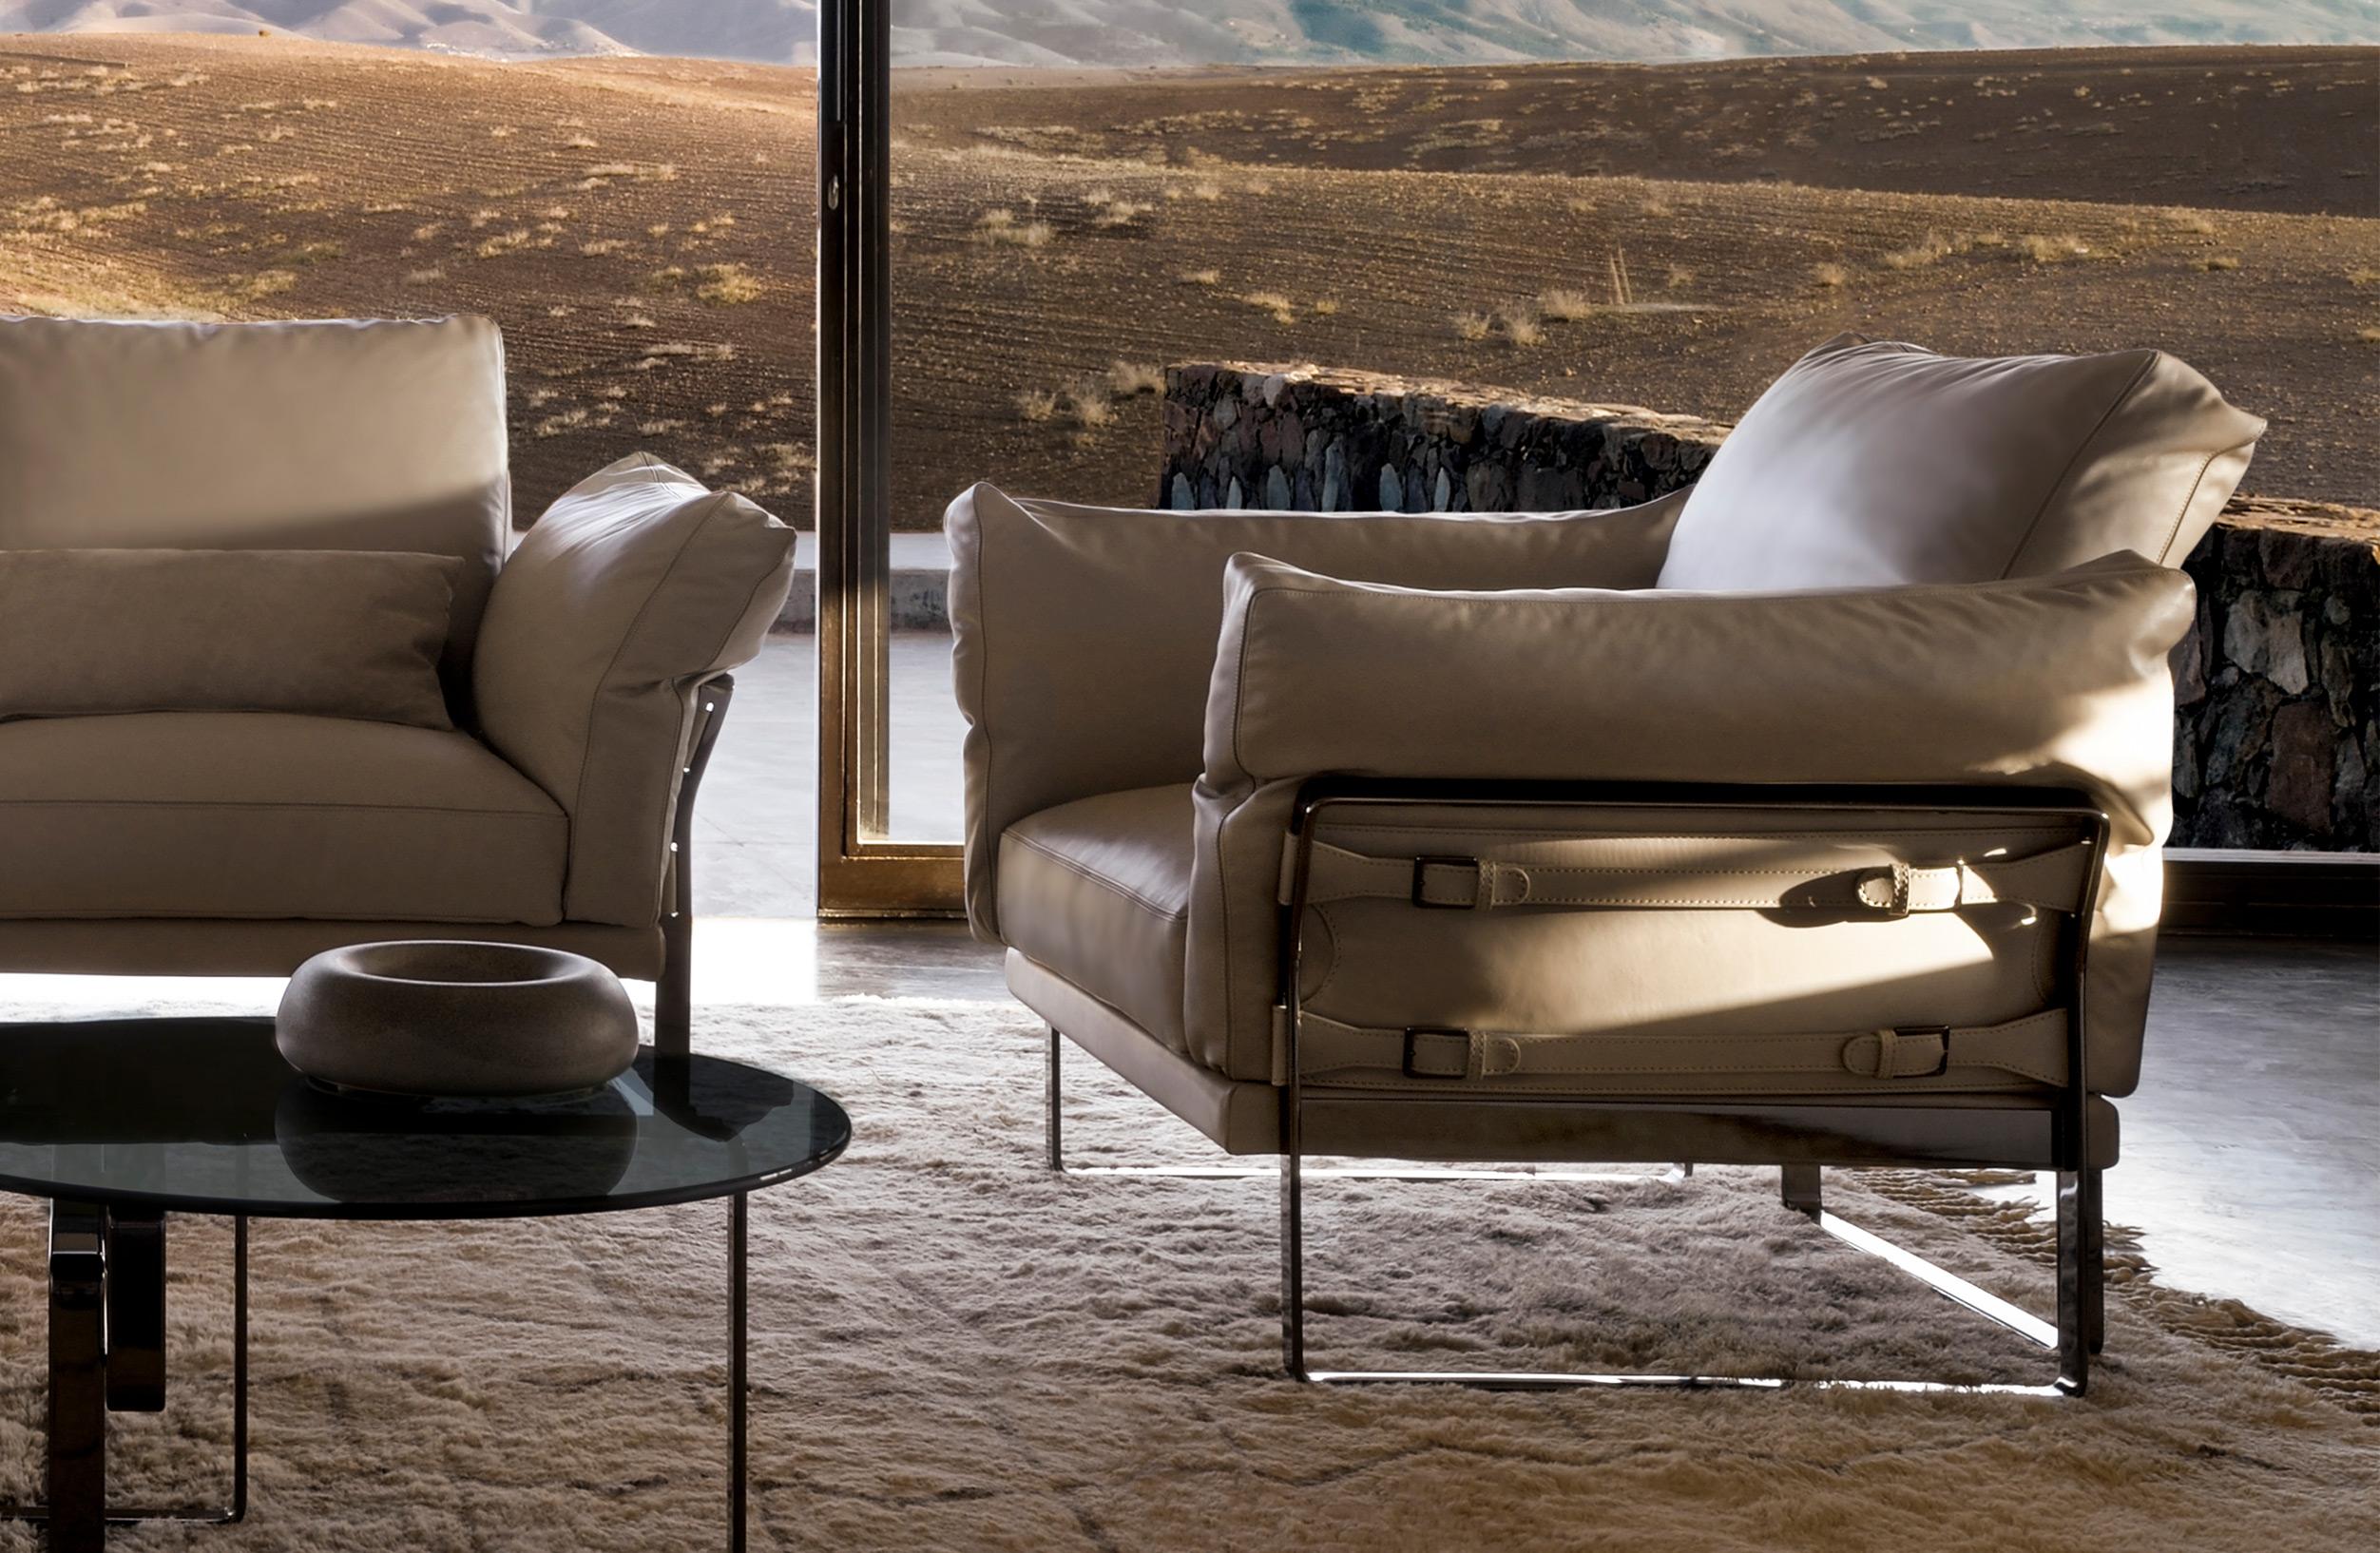 Fendi Outdoor Furniture Fendi Outdoor Furniture With Fendi  # Muebles Fendi Casa